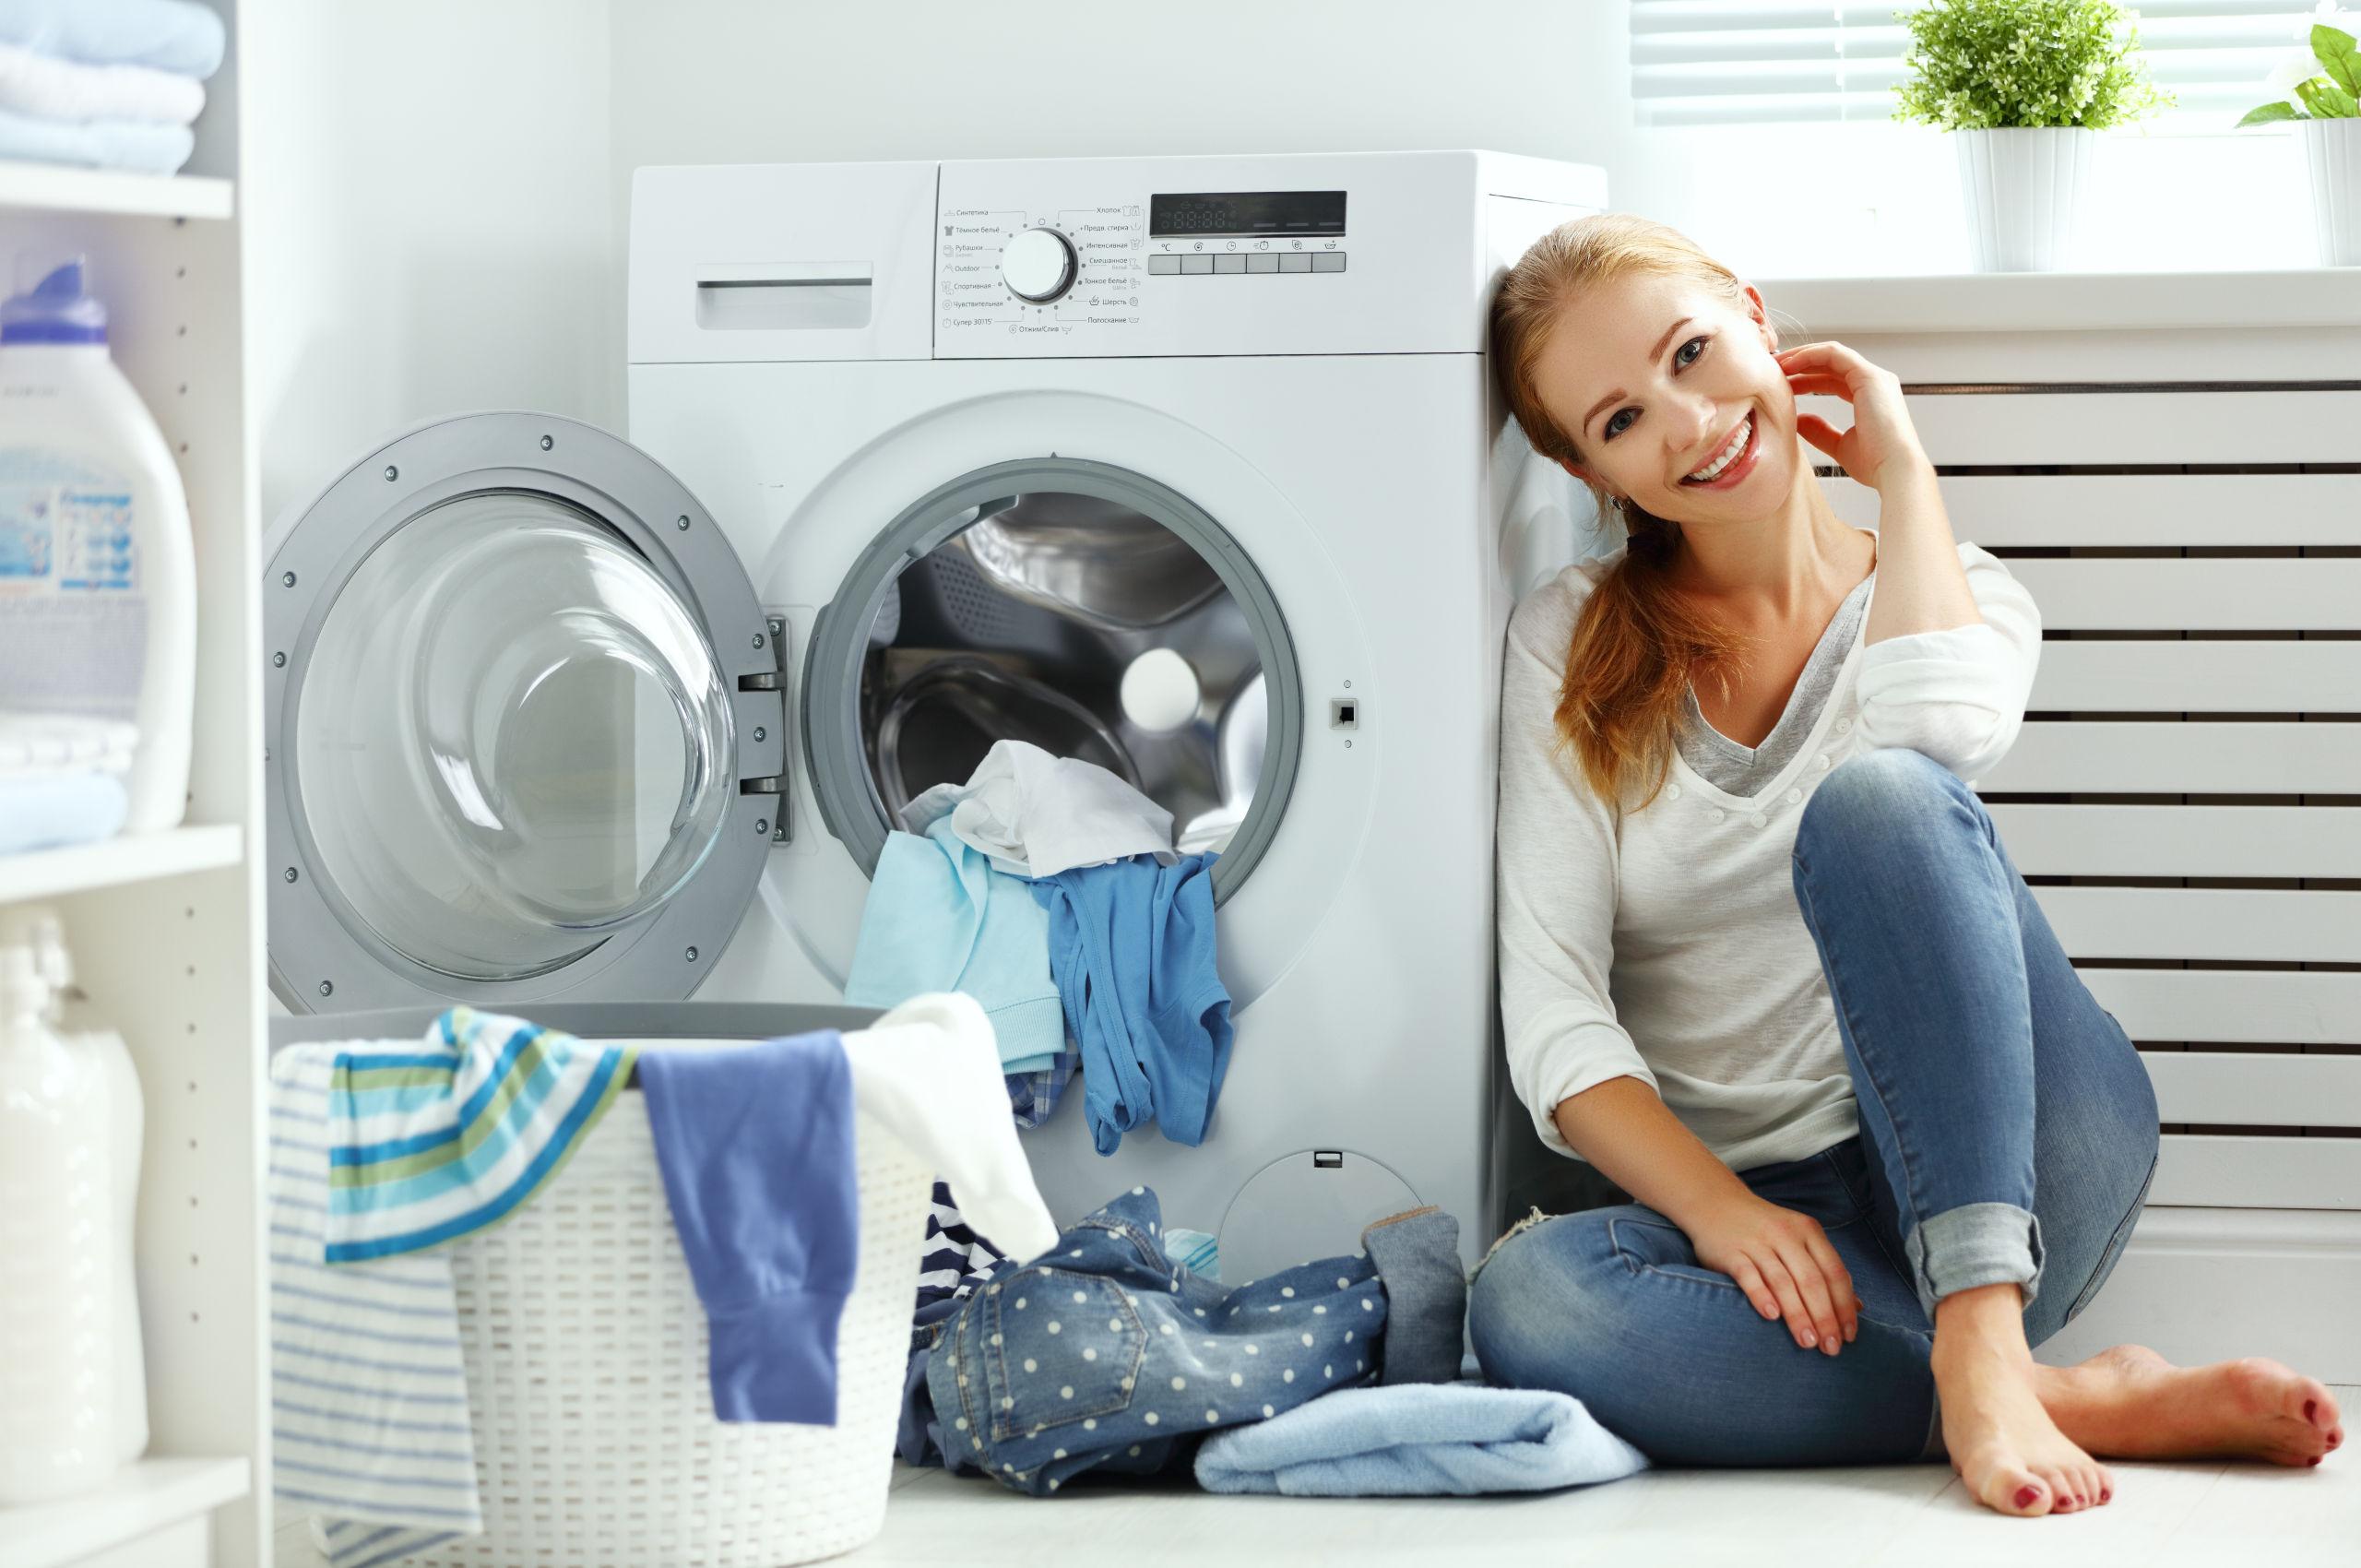 568125c48ec Πώς θα κάνετε να μην μυρίζει άσχημα το πλυντήριο ρούχων - Όλα Για ...